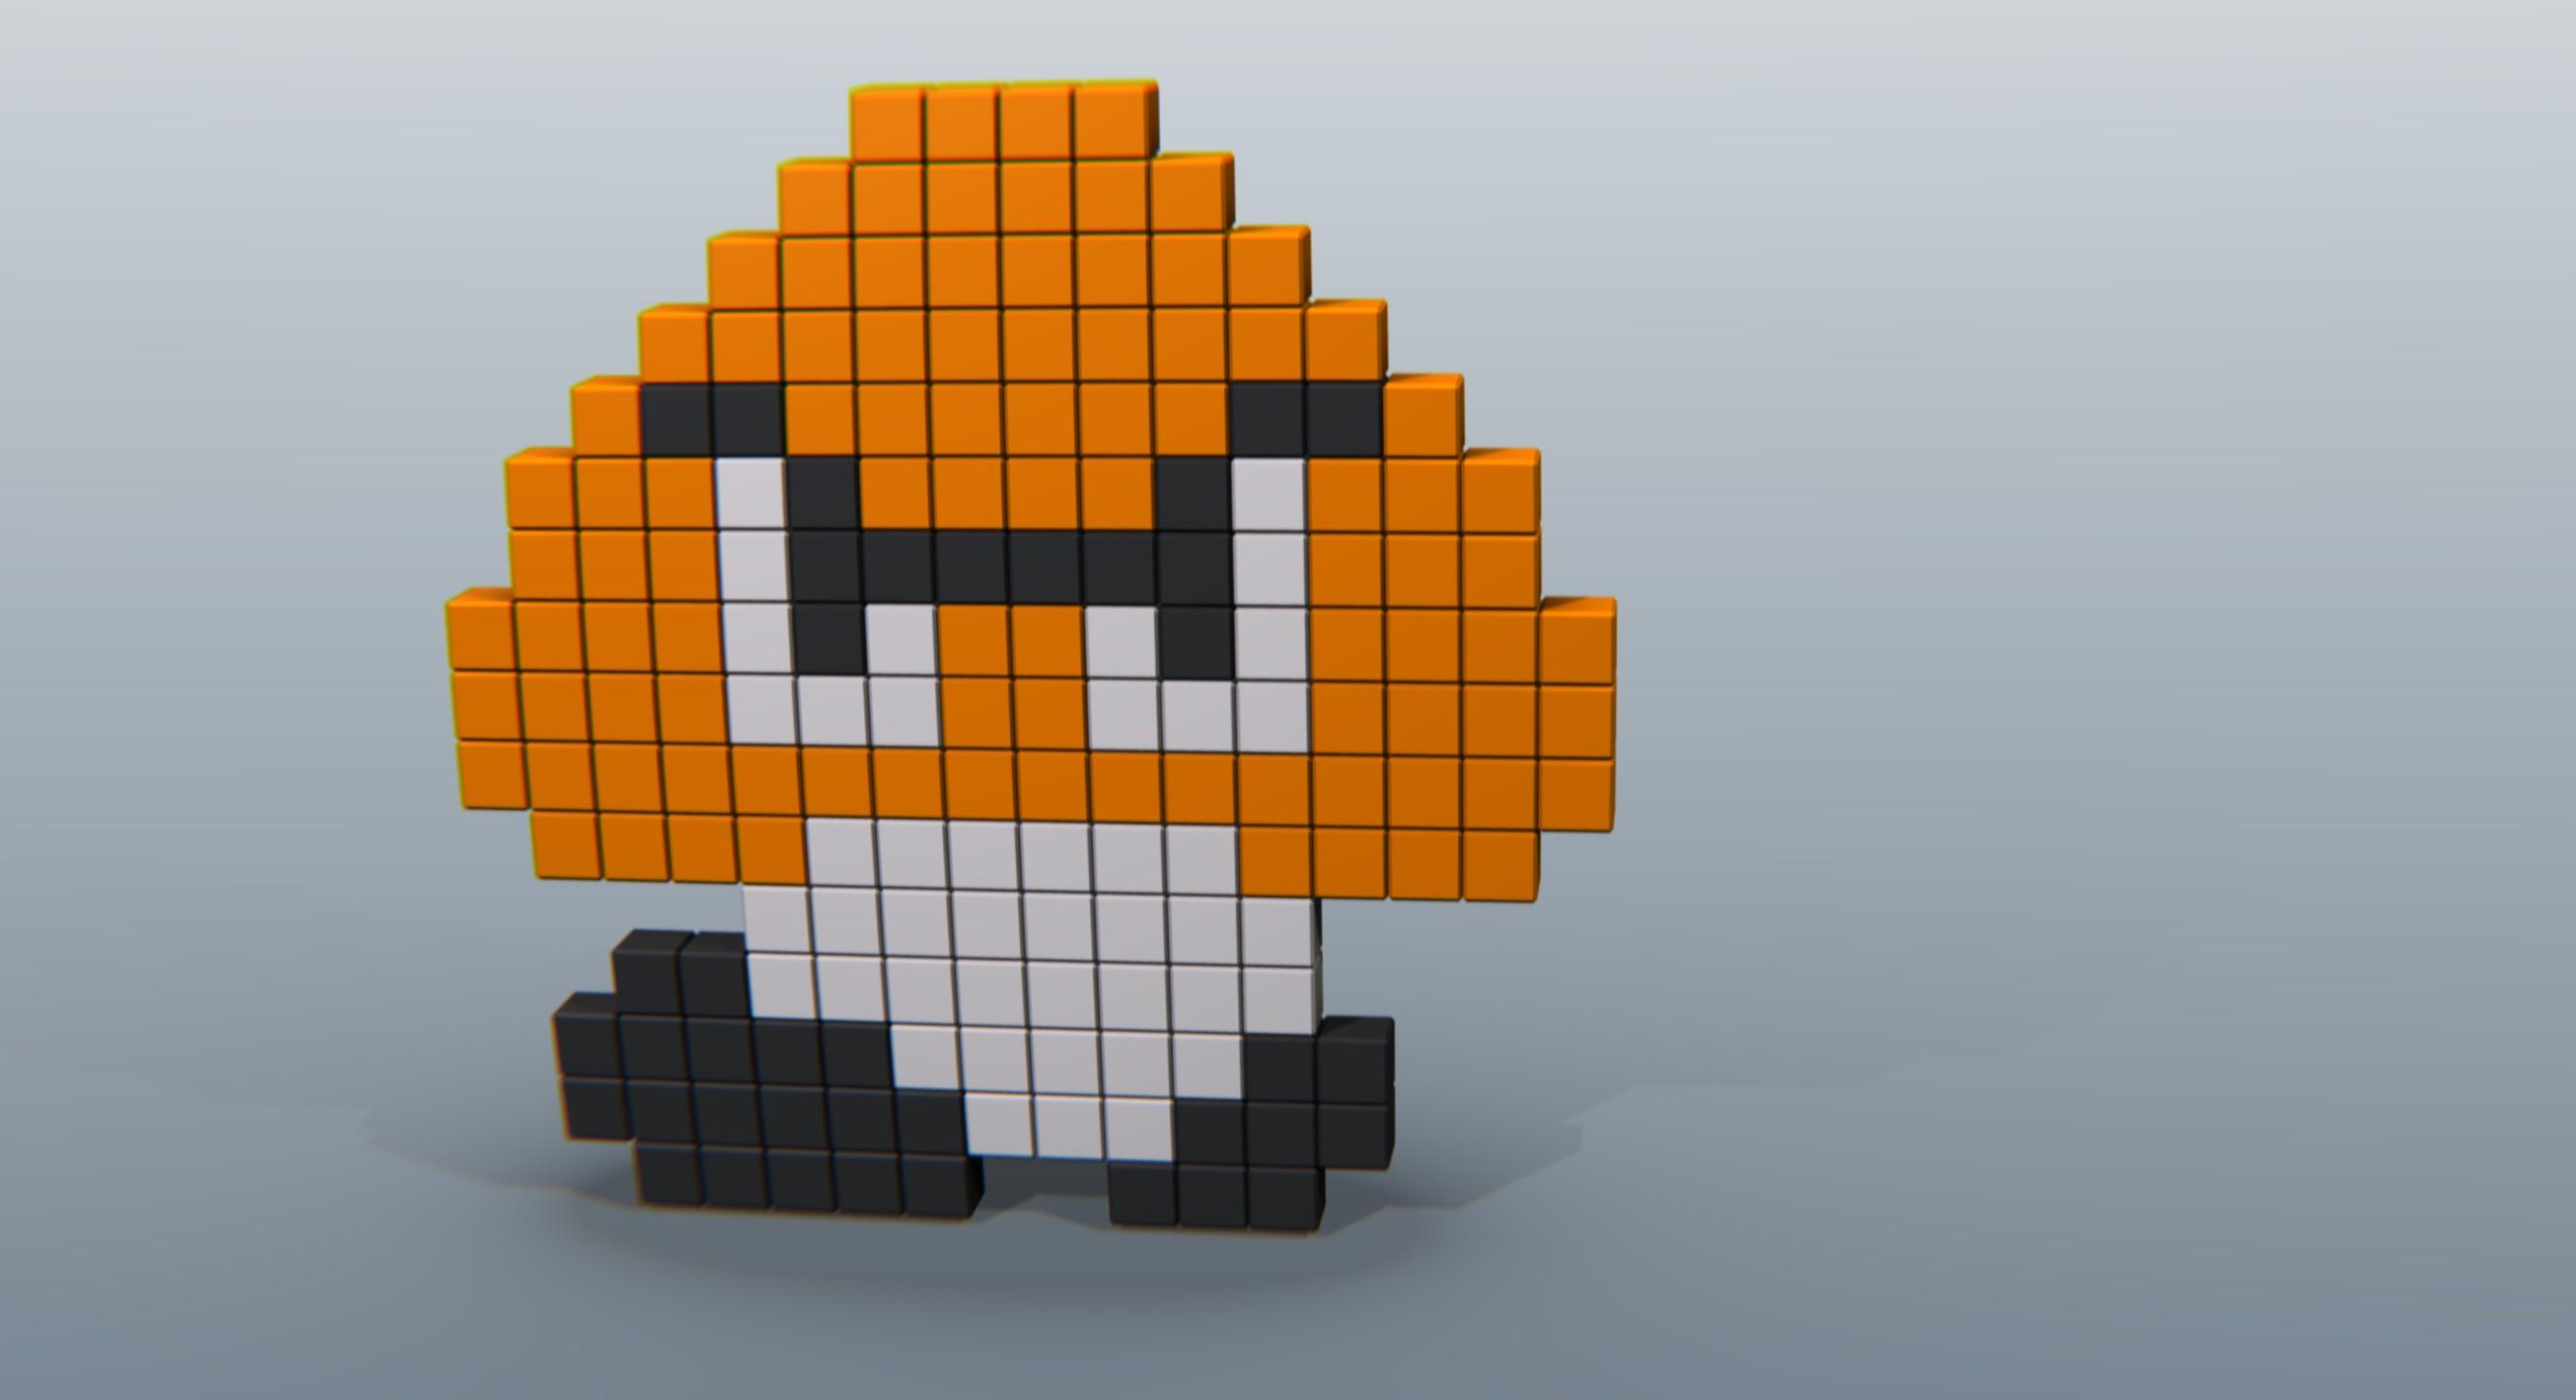 super-mario-pixel-art-goombasuper-mario-brothers-wallpapers---imac-kbac6mdi